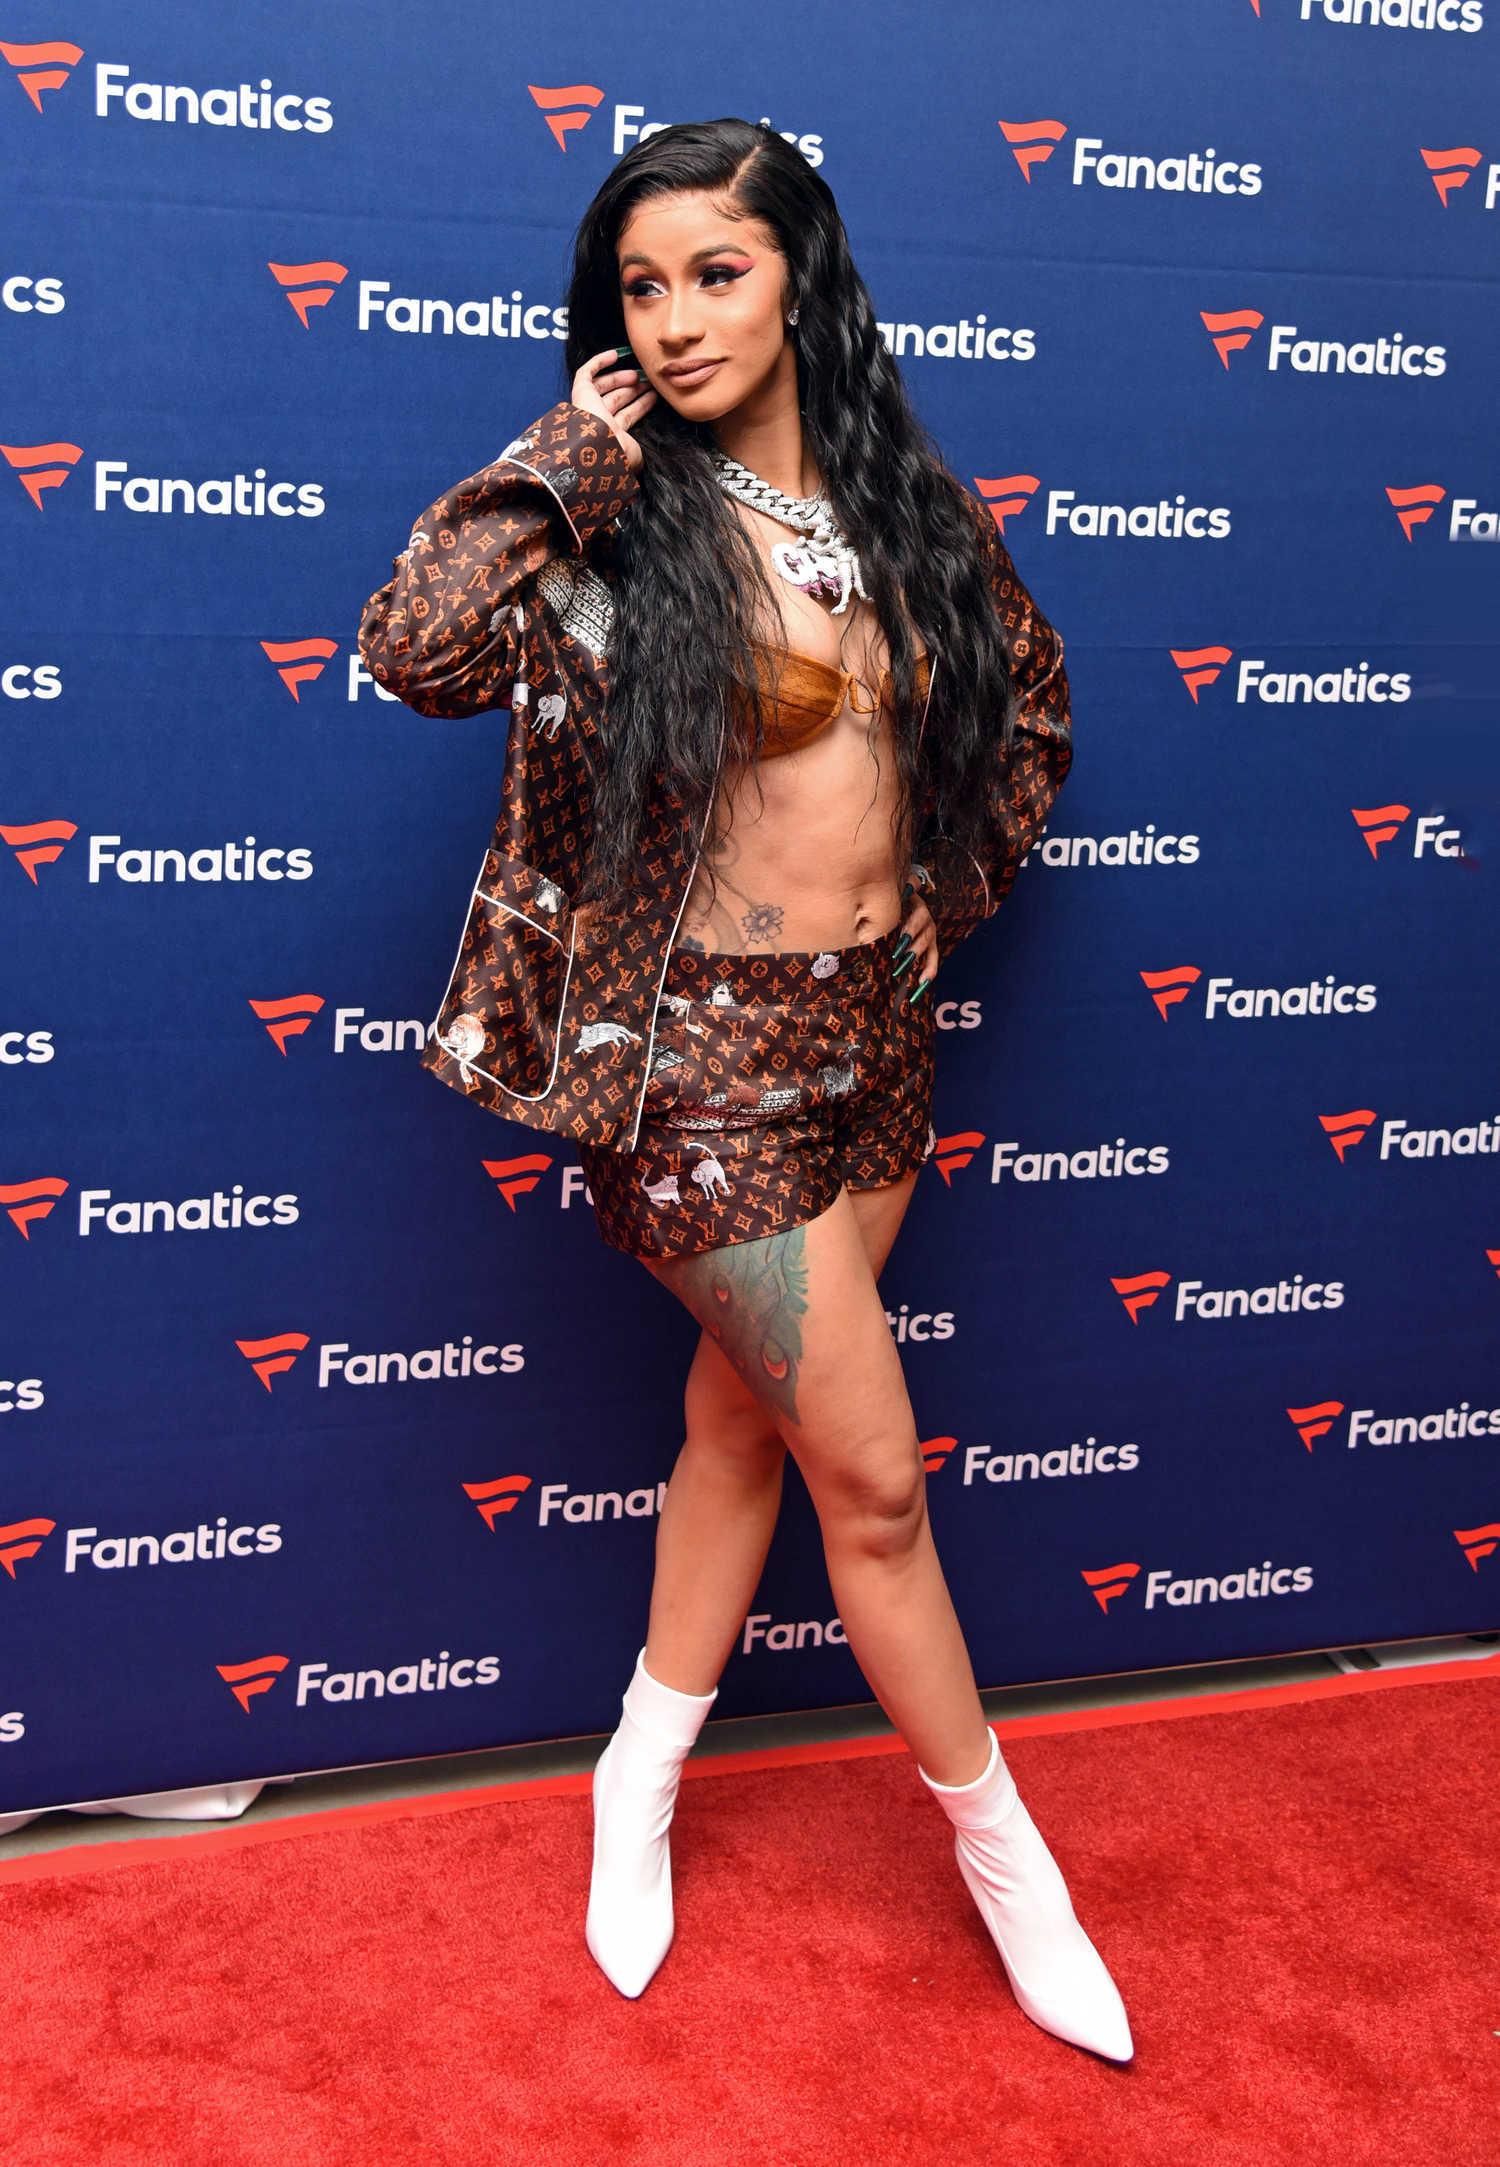 Cardi B Attends Fanatics Super Bowl Party In Atlanta